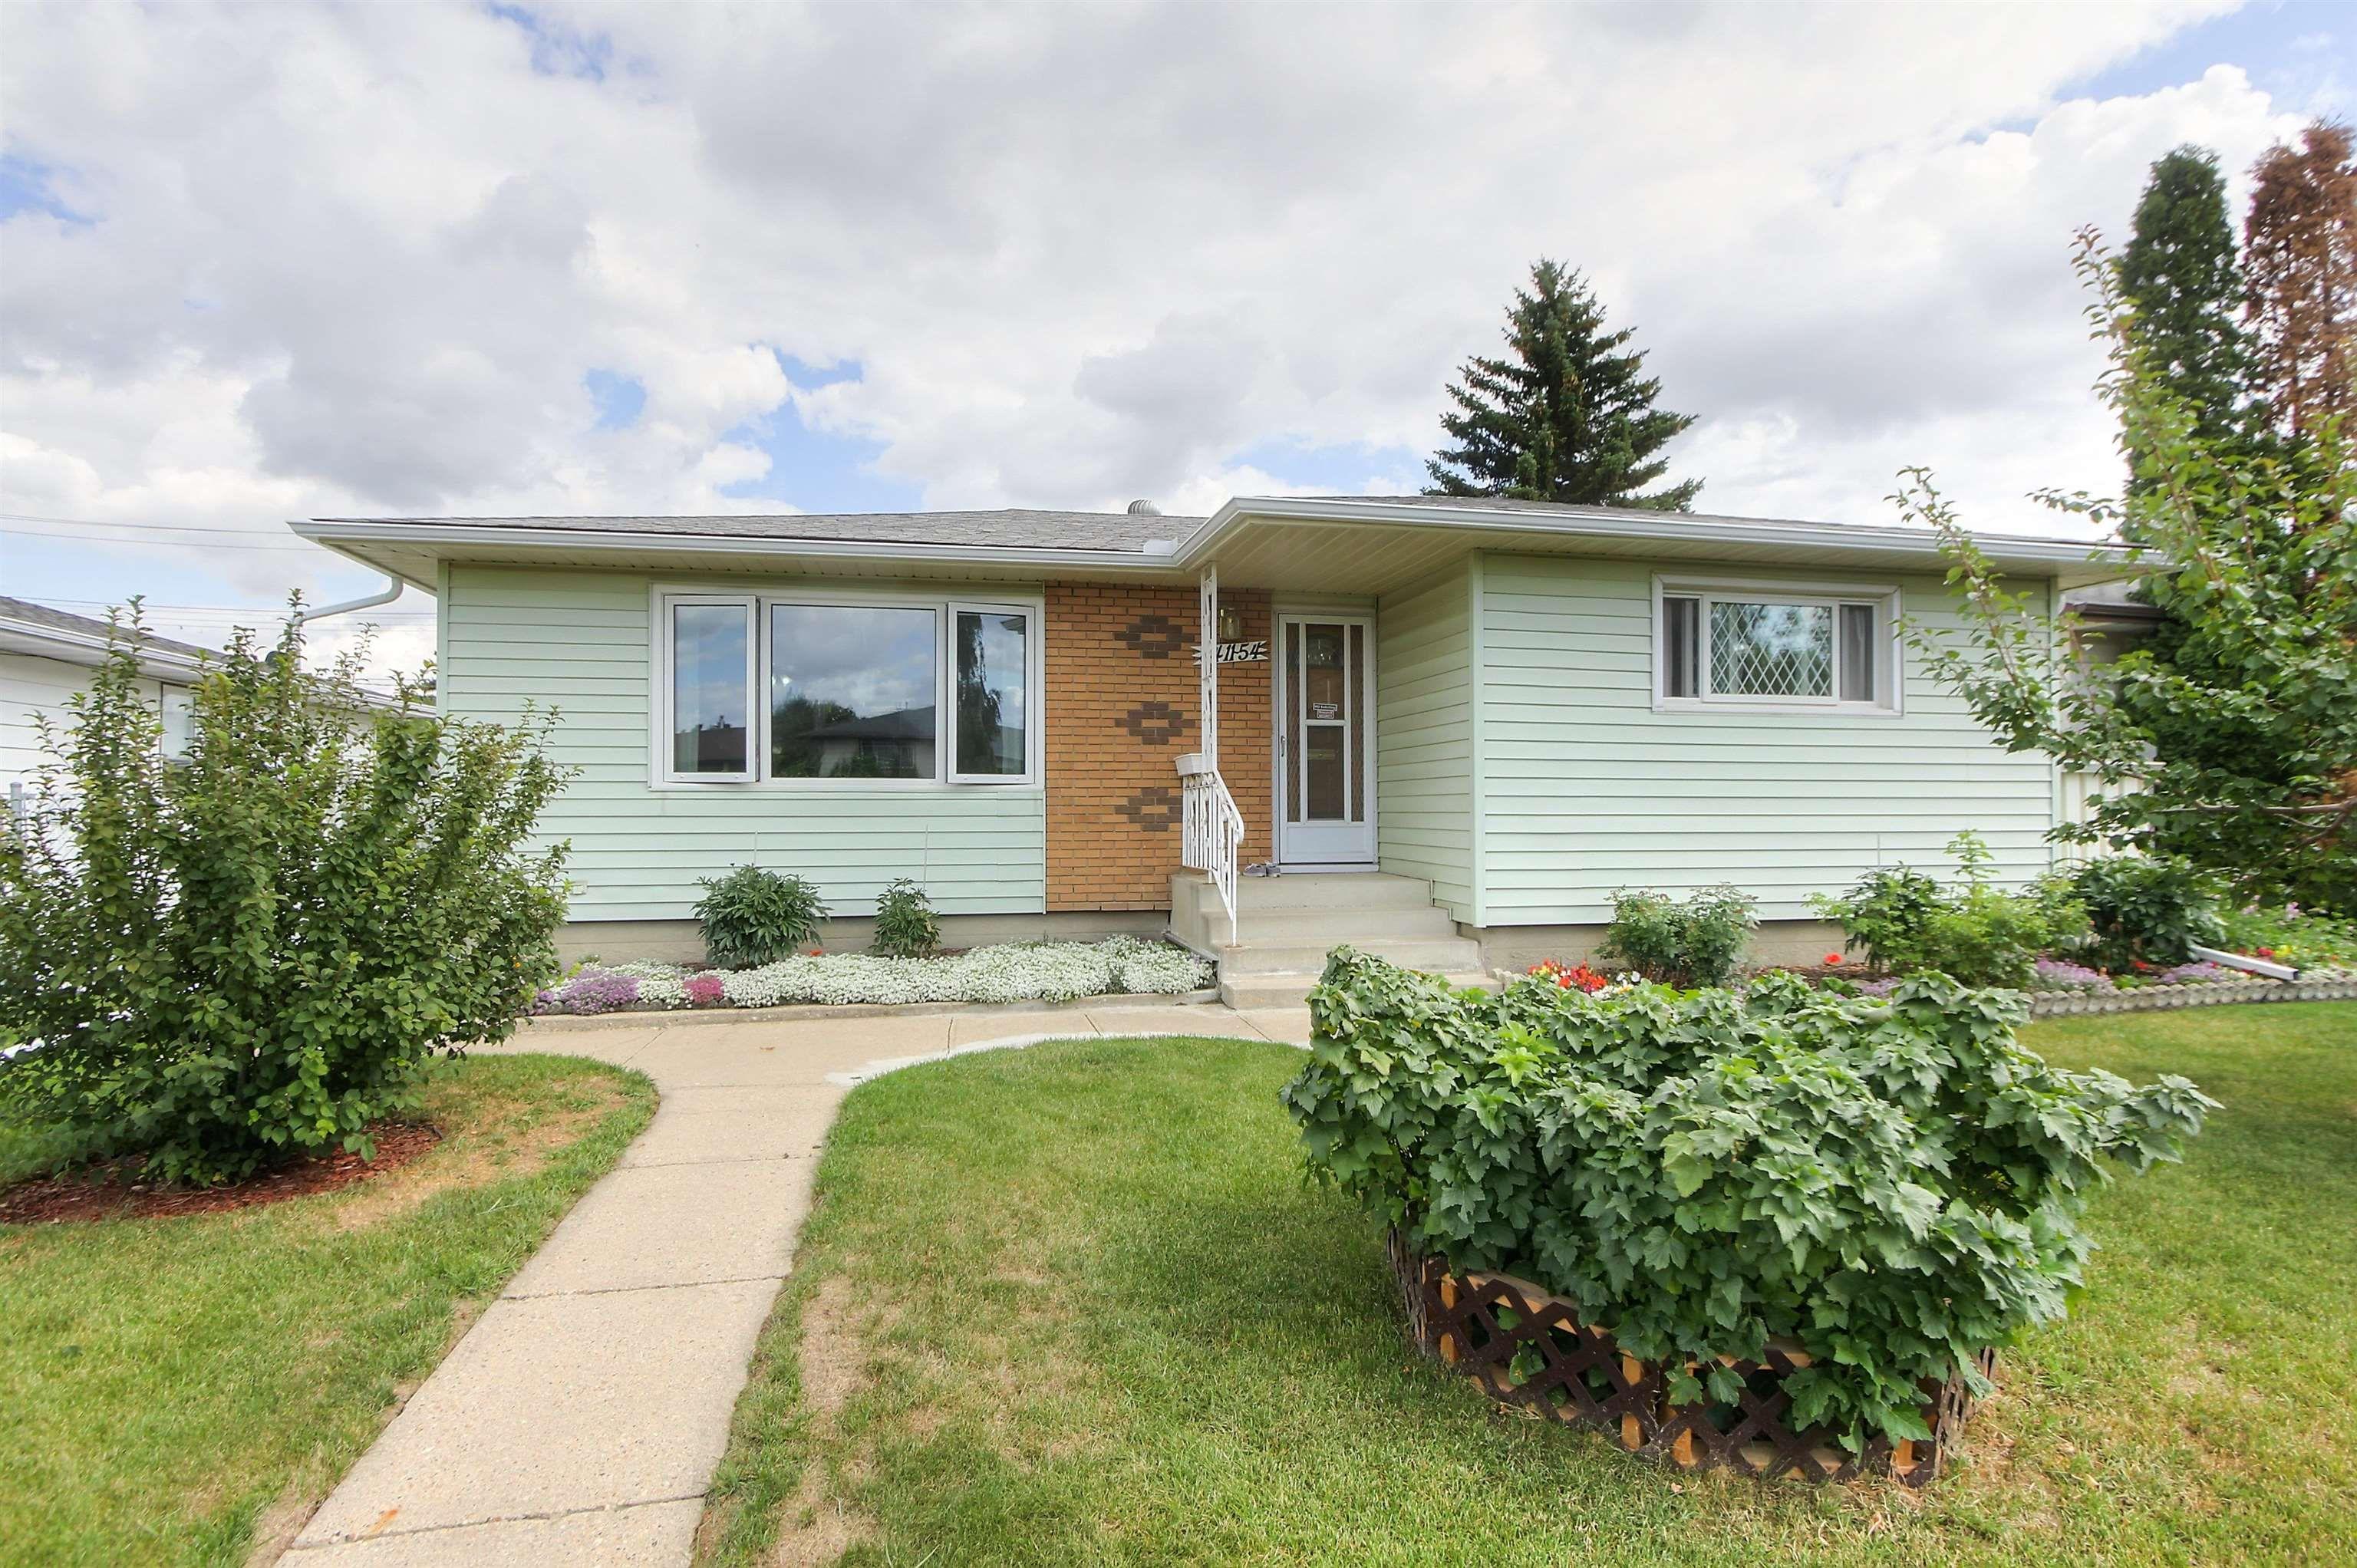 Main Photo: 8411 54 Street in Edmonton: Zone 18 House for sale : MLS®# E4260377